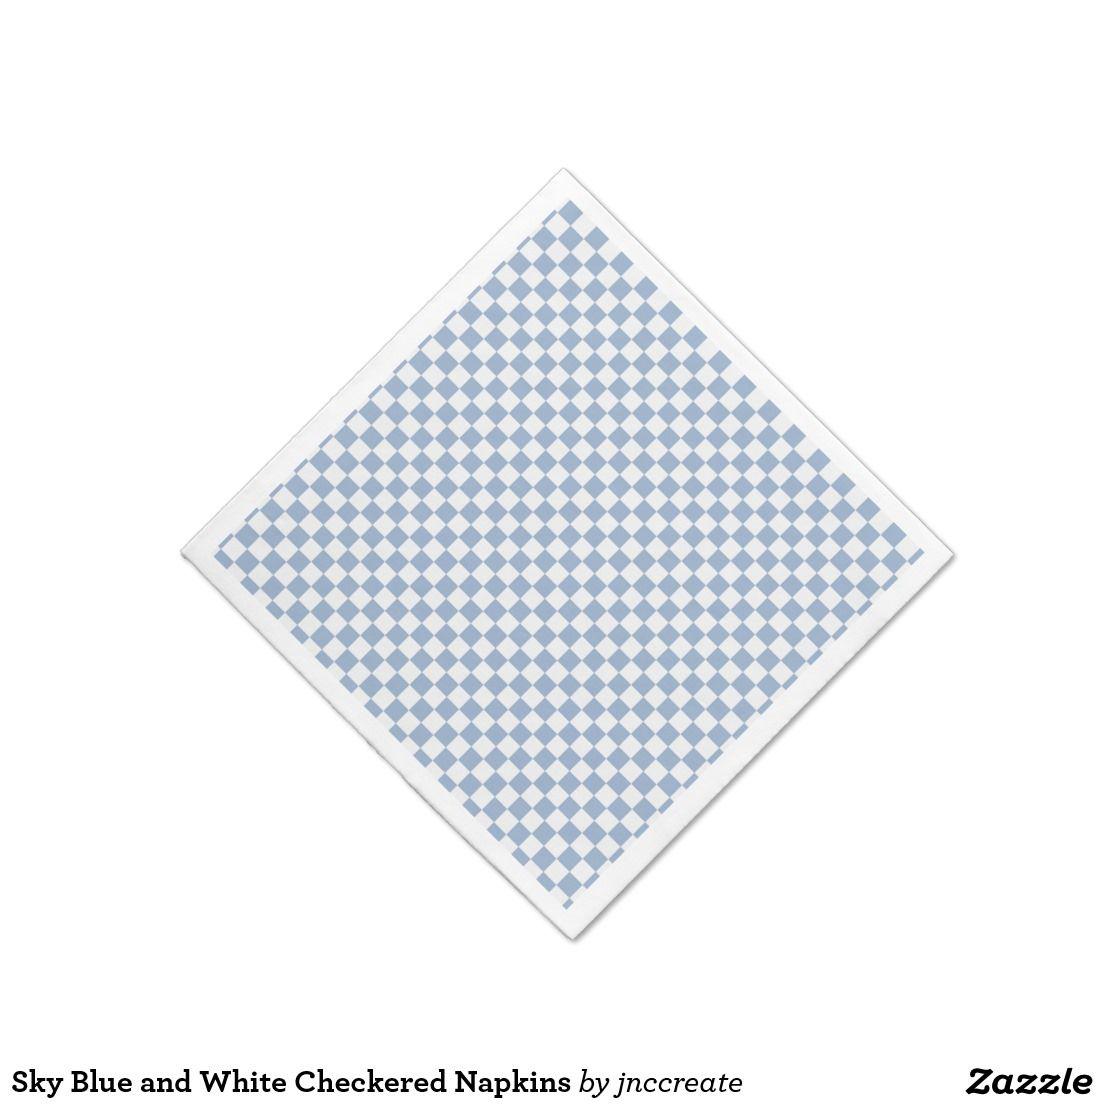 Sky Blue and White Checkered Napkins